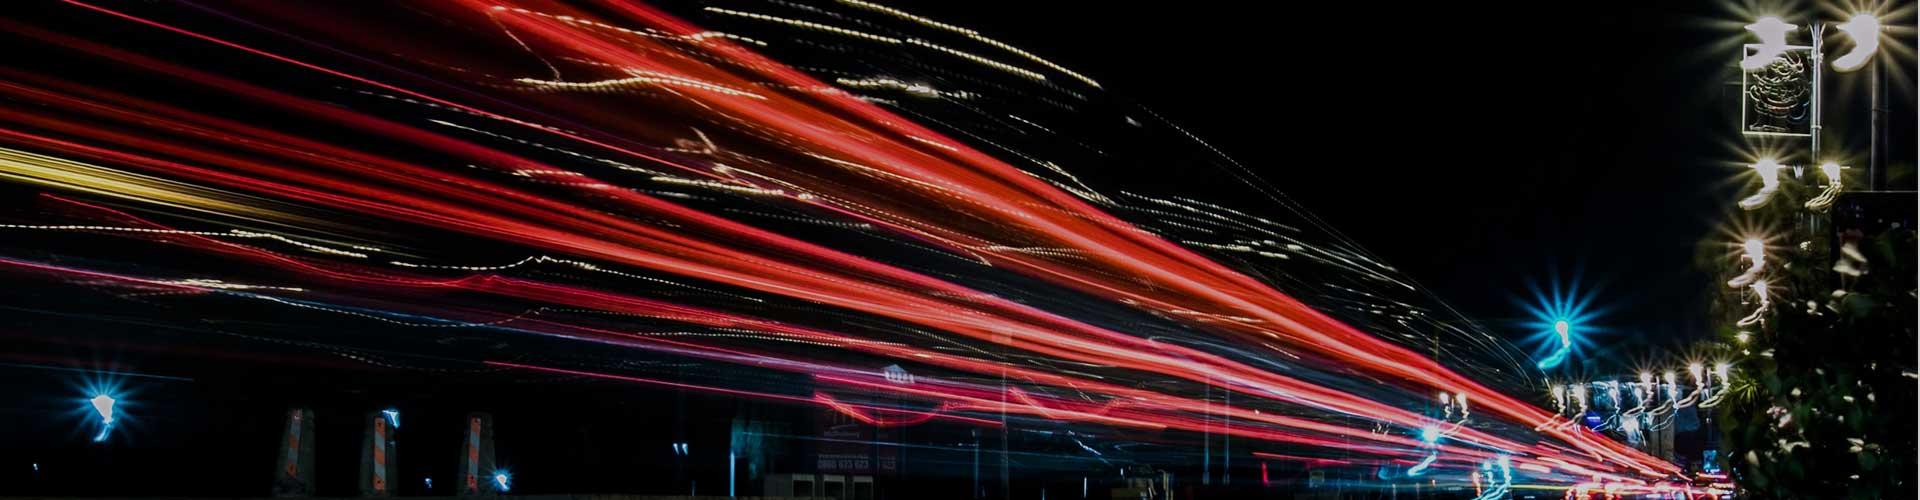 webinar-add-more-speed-to-your-daily-digital-asset-management-tasks